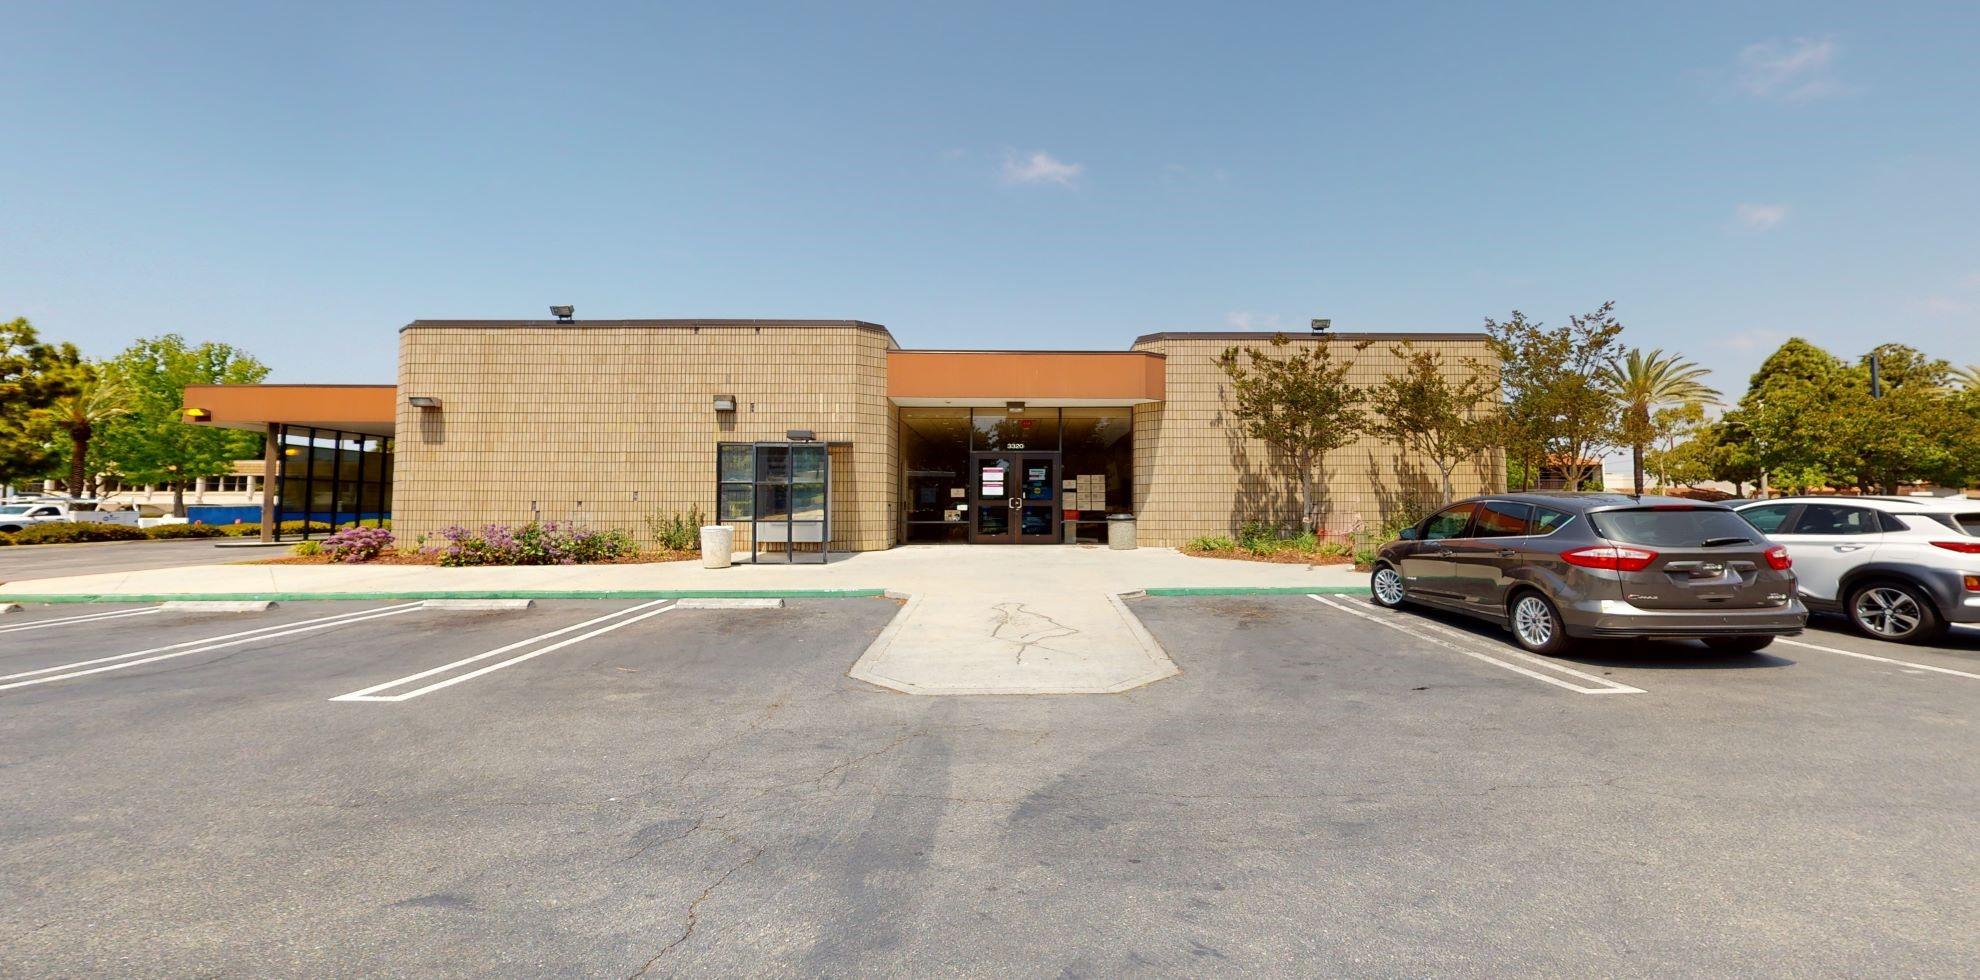 Bank of America financial center with drive-thru ATM | 3320 Ocean Park Blvd, Santa Monica, CA 90405